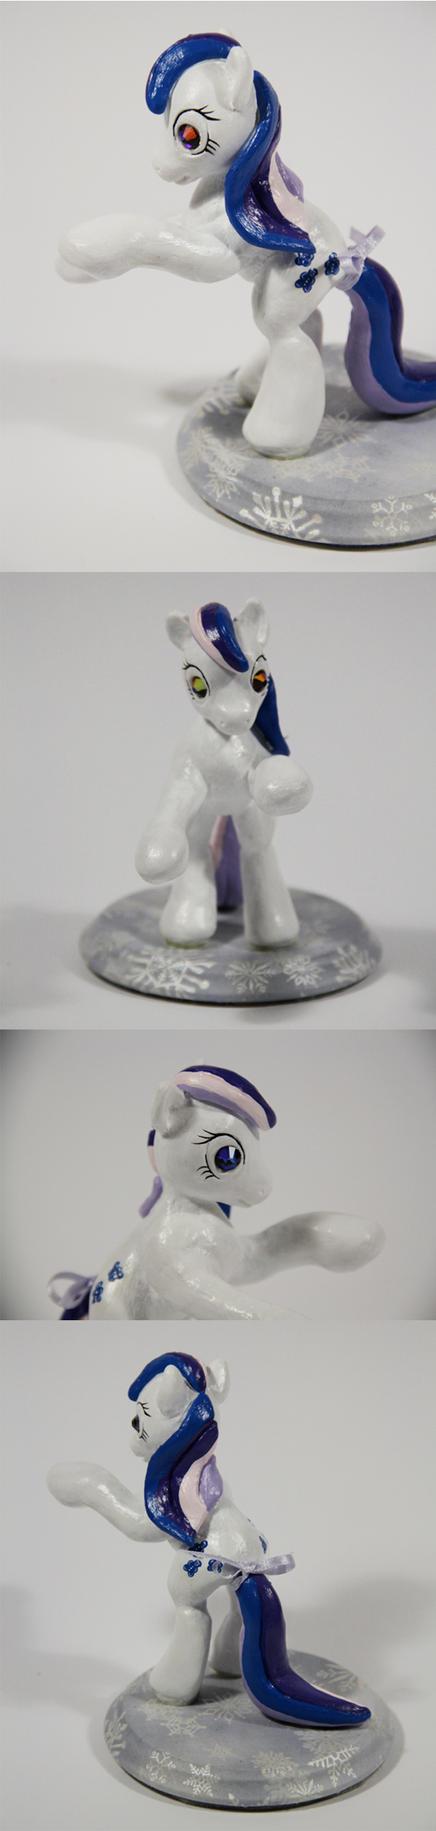 Gingerbread - Twinkle eyed pony in g4 pose (2) by elfenkatze